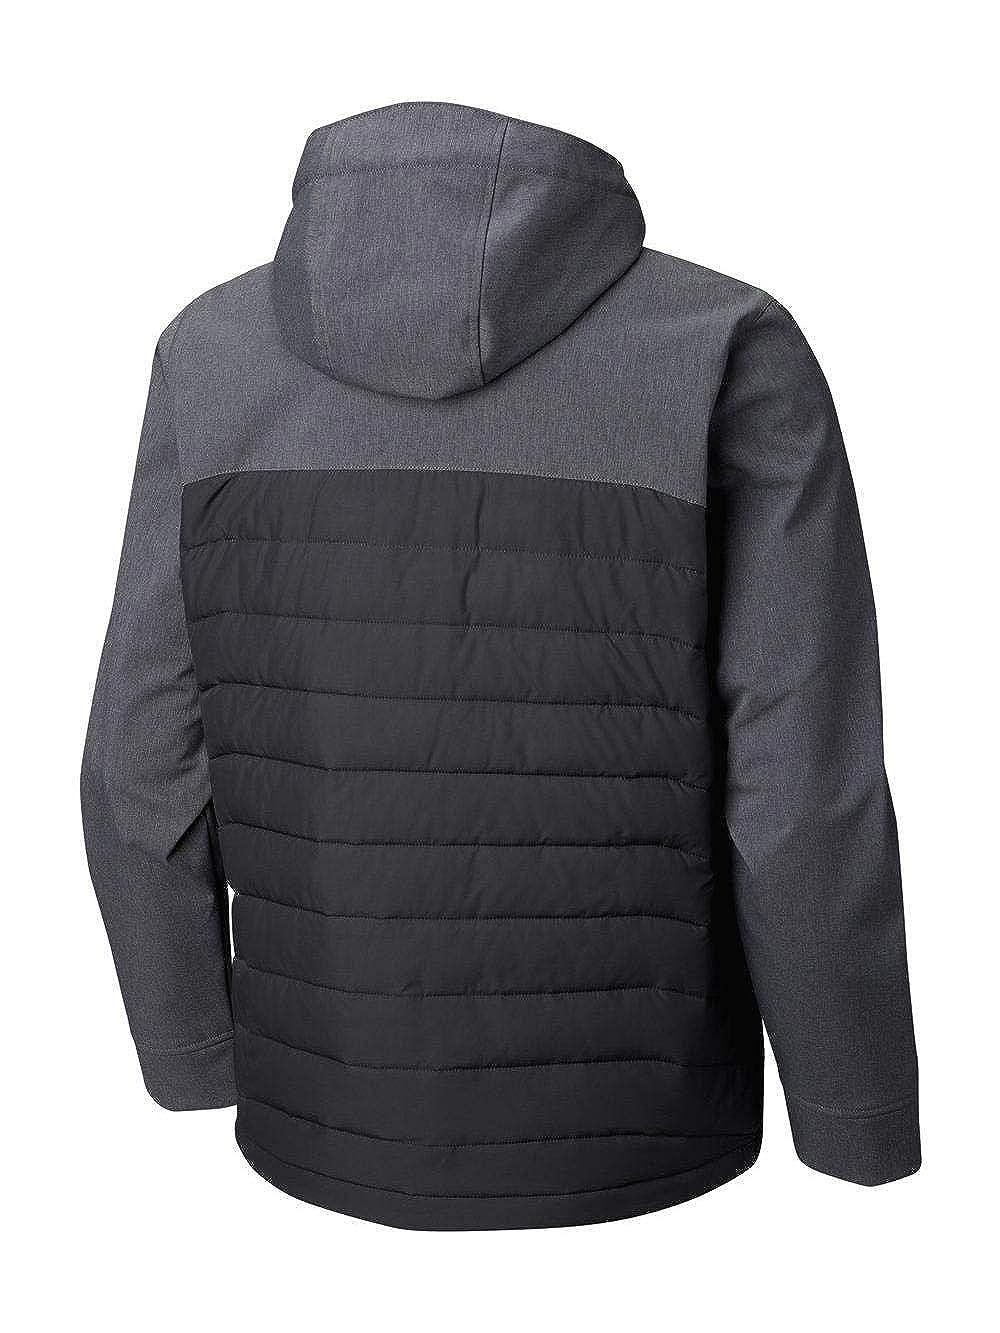 179912 Oyanta Trail Hybrid Hooded Puffer Jacket Columbia